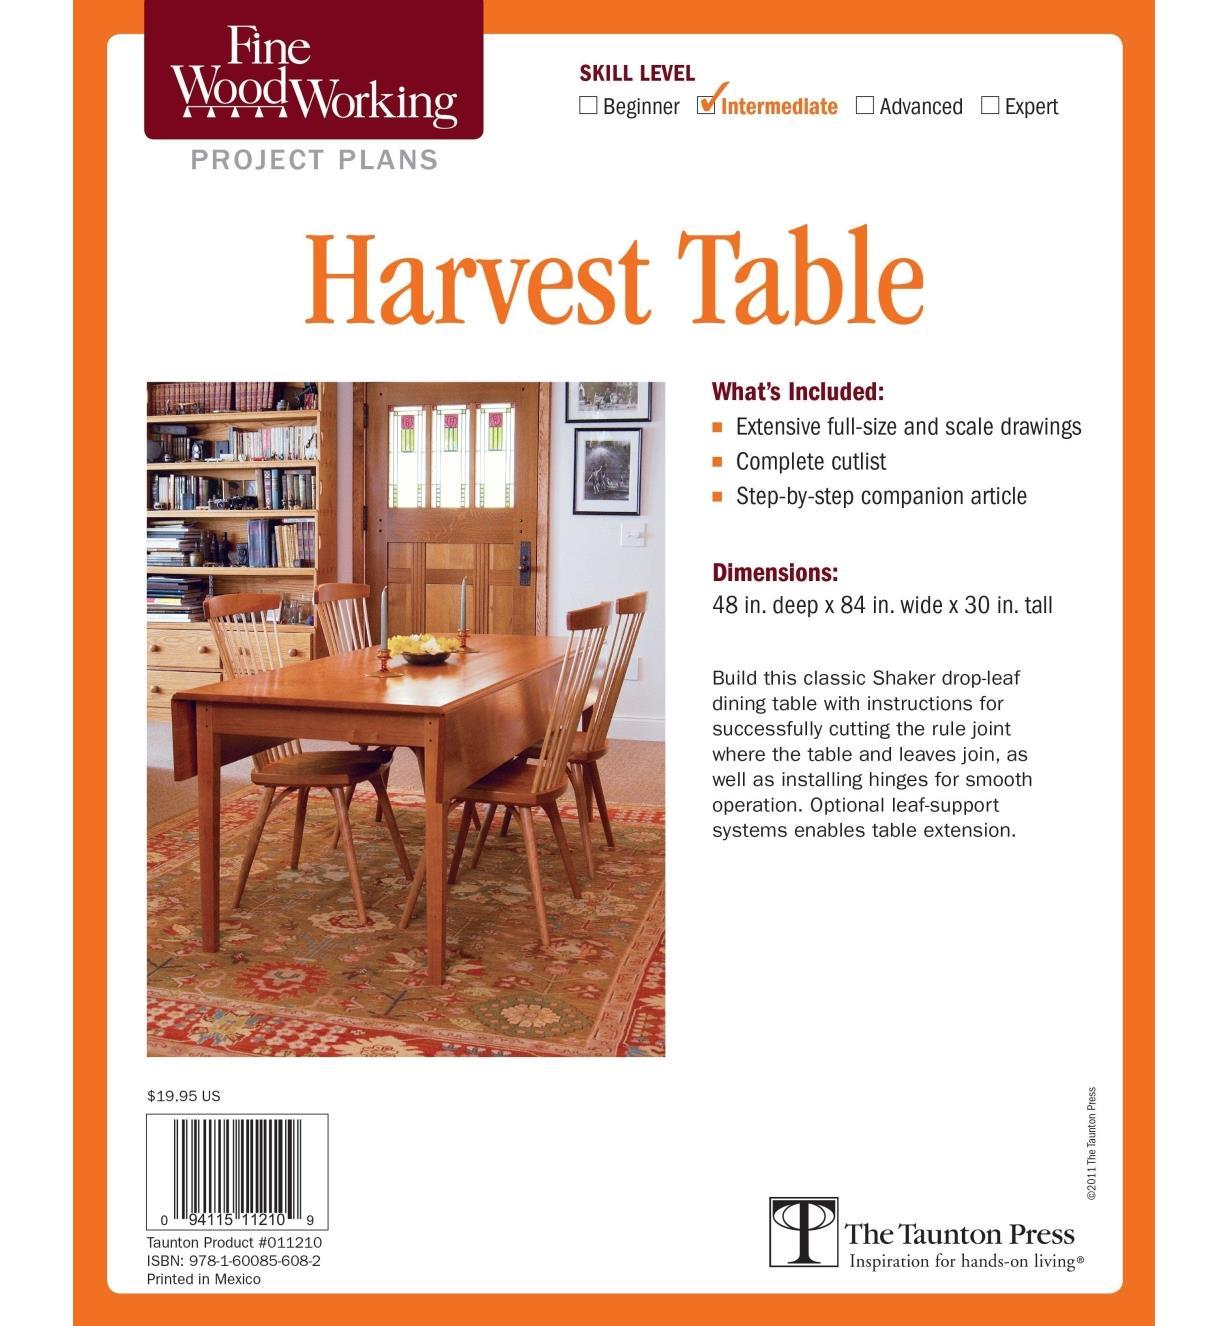 73L2537 - Harvest Table Plan